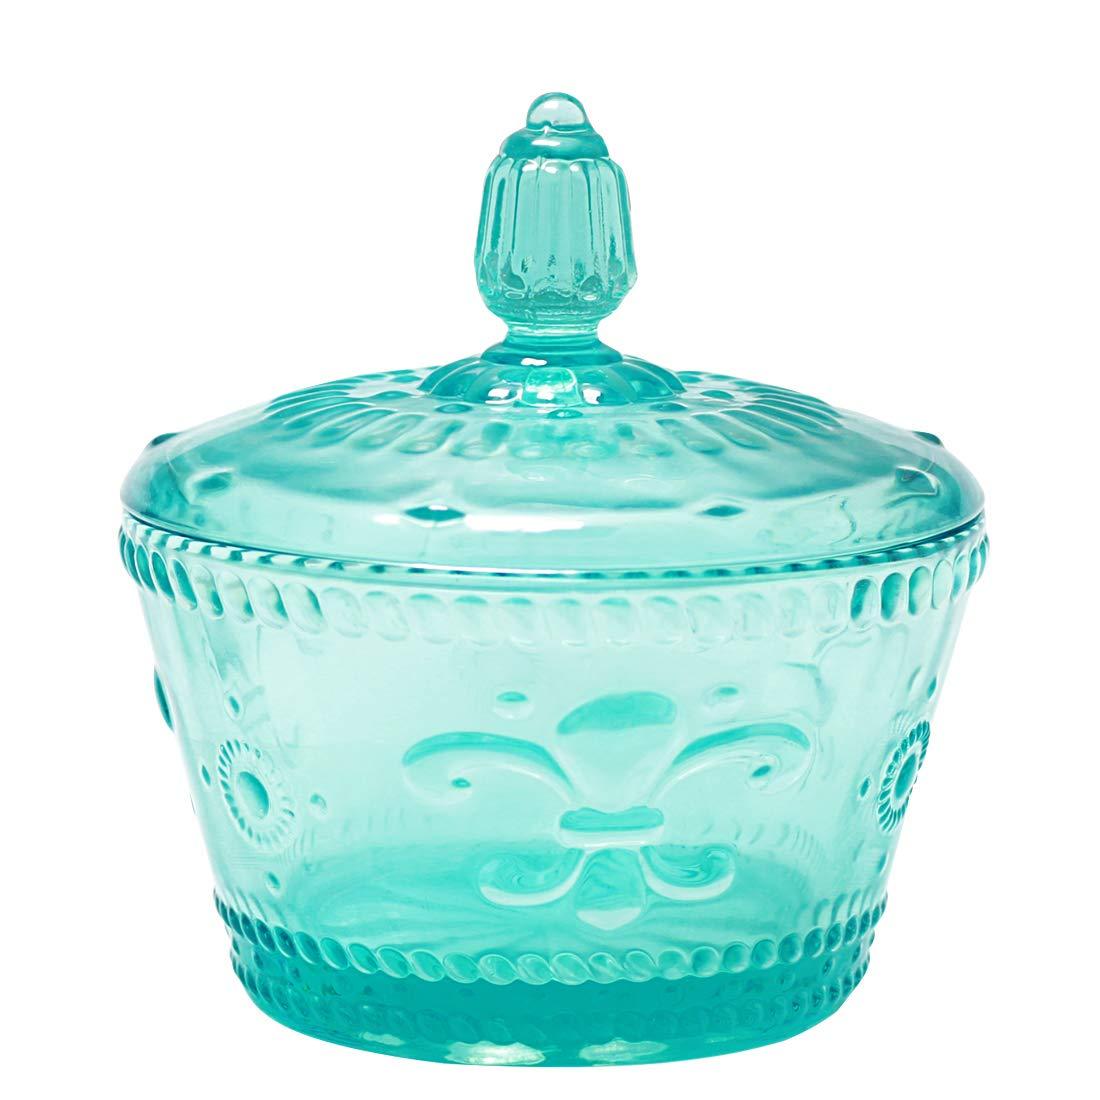 Jomop Glass Sugar Bowl with Lid Colorful 10 oz (Blue)